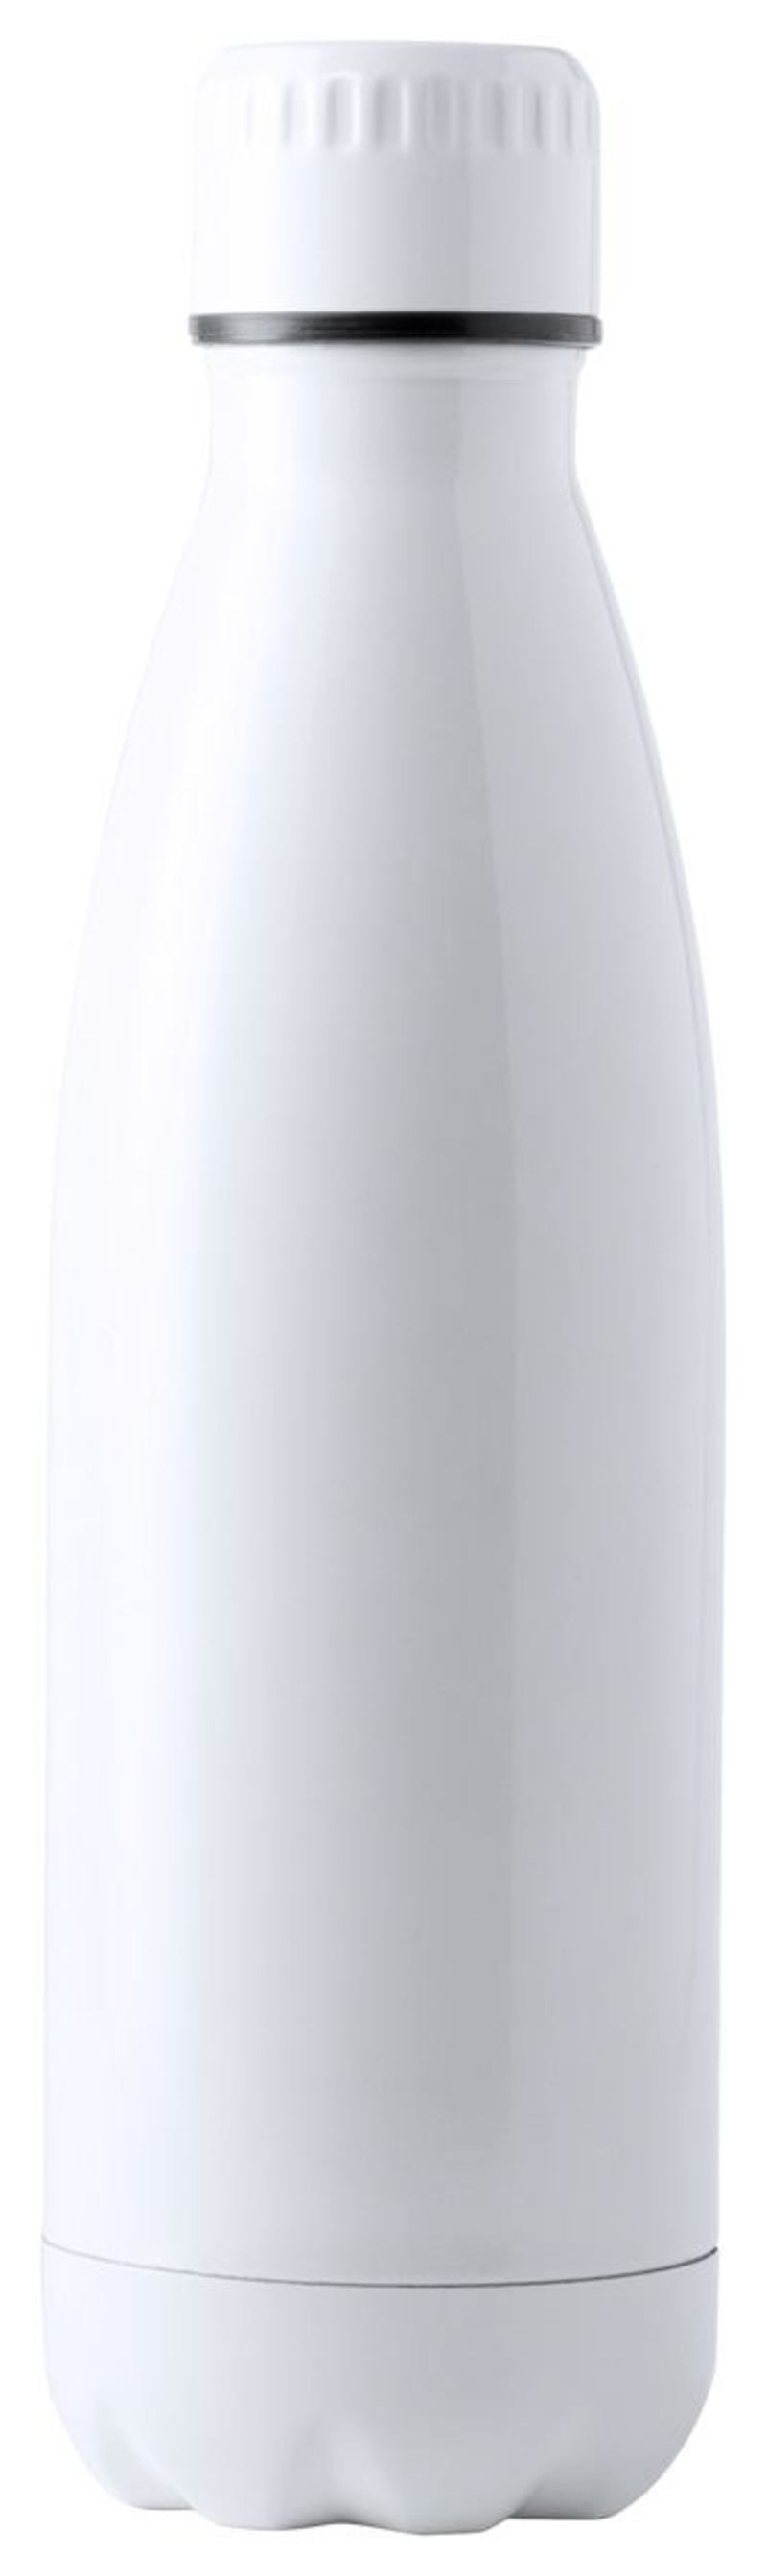 Bayron sport bottle